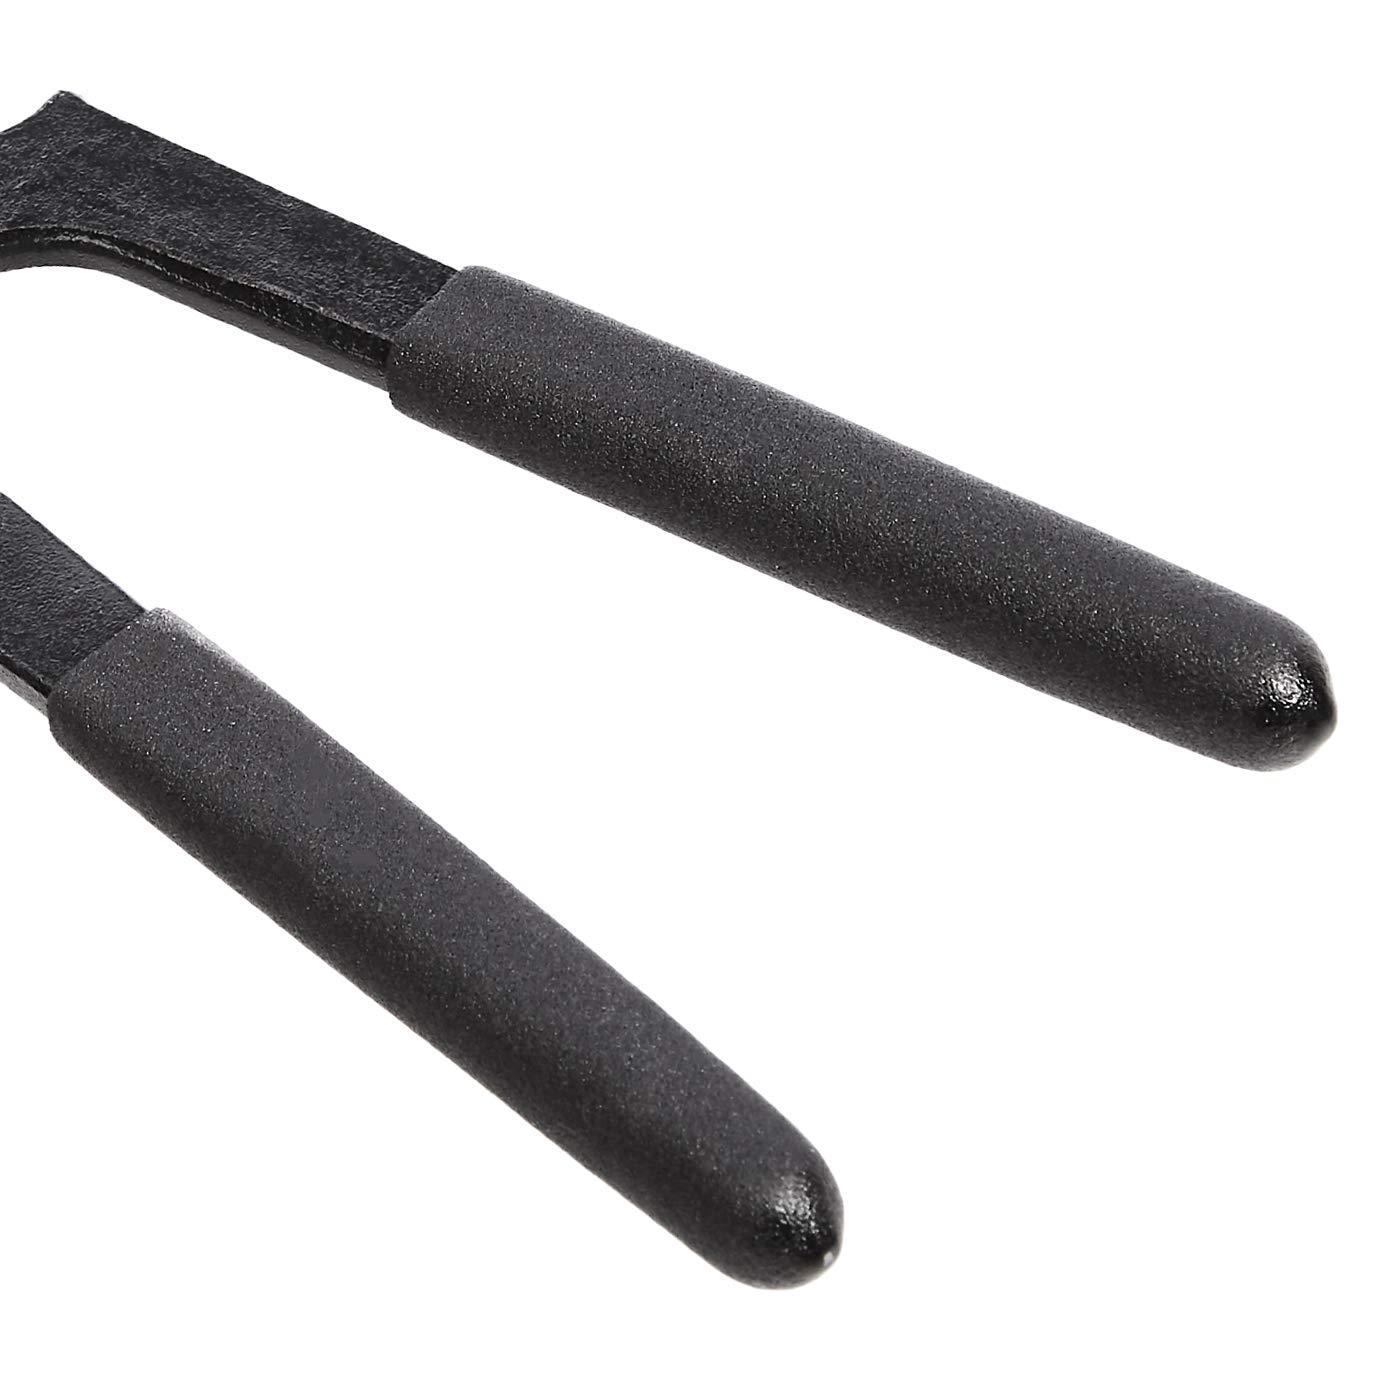 Basics 205 mm Tenazas rusas de acero al cromo vanadio